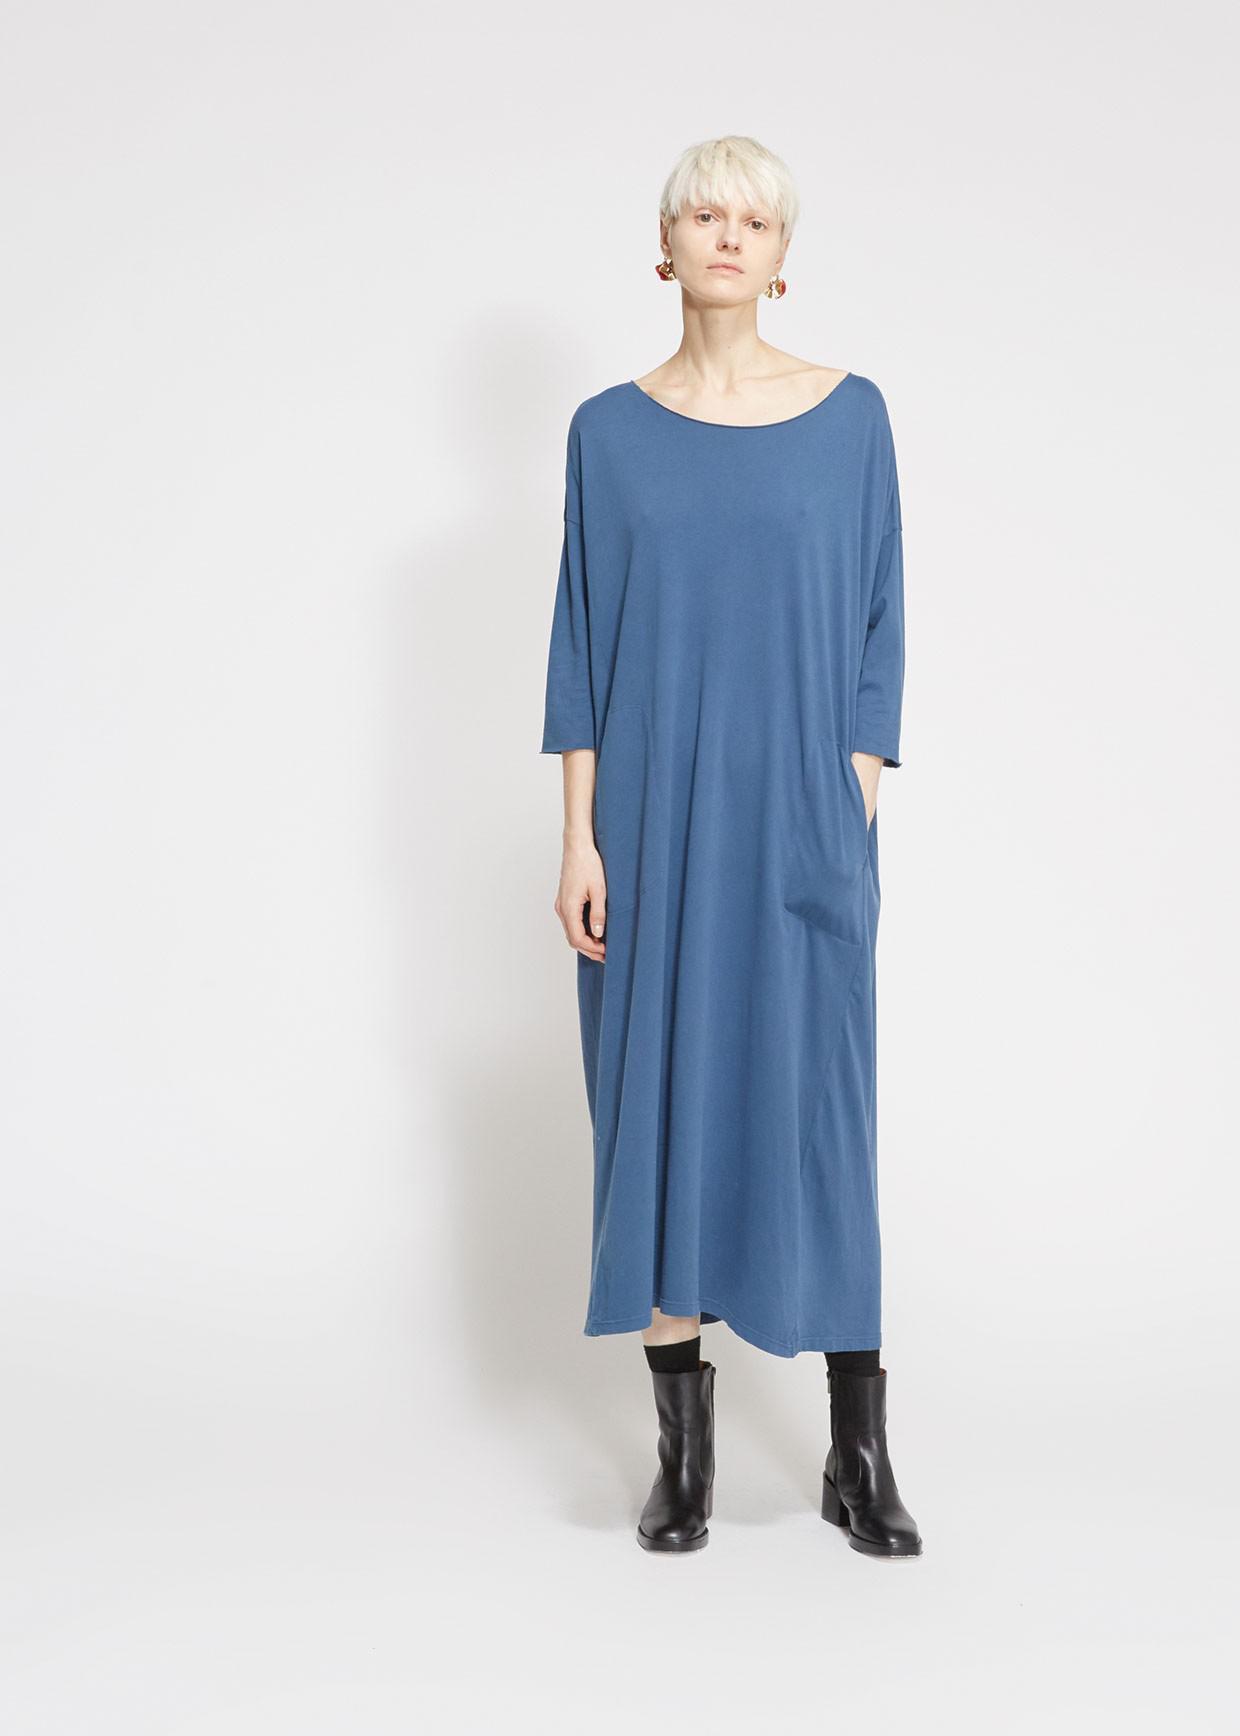 6285aa0659b532 Raquel Allegra Cocoon Dress in Blue - Lyst